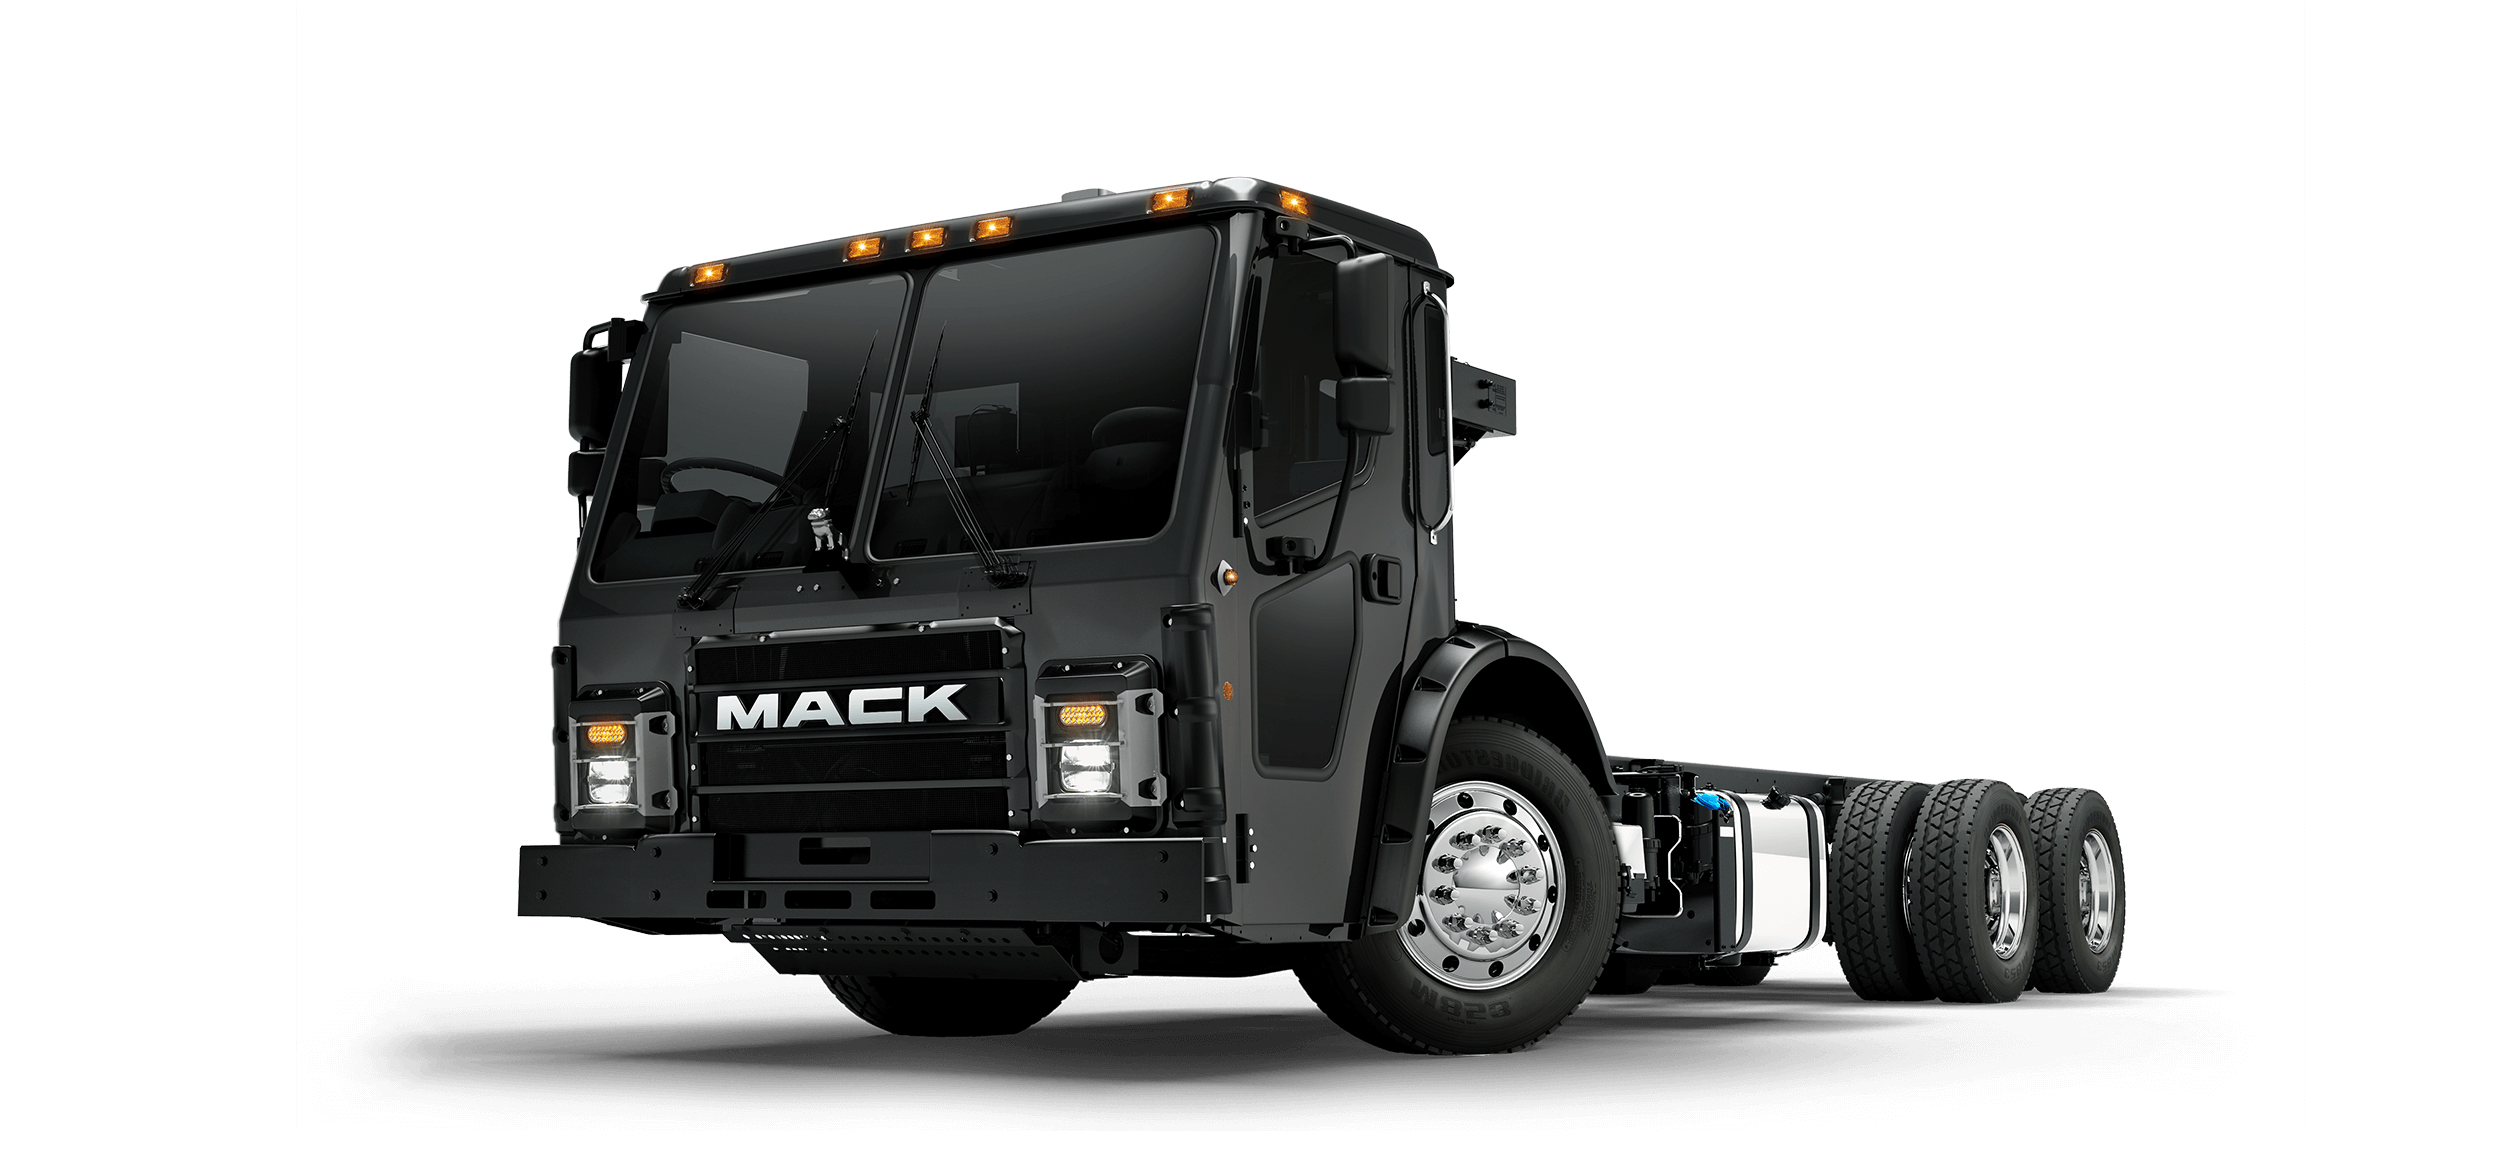 Mack Truck Windshield Glass Replacement Company Sacramento CA